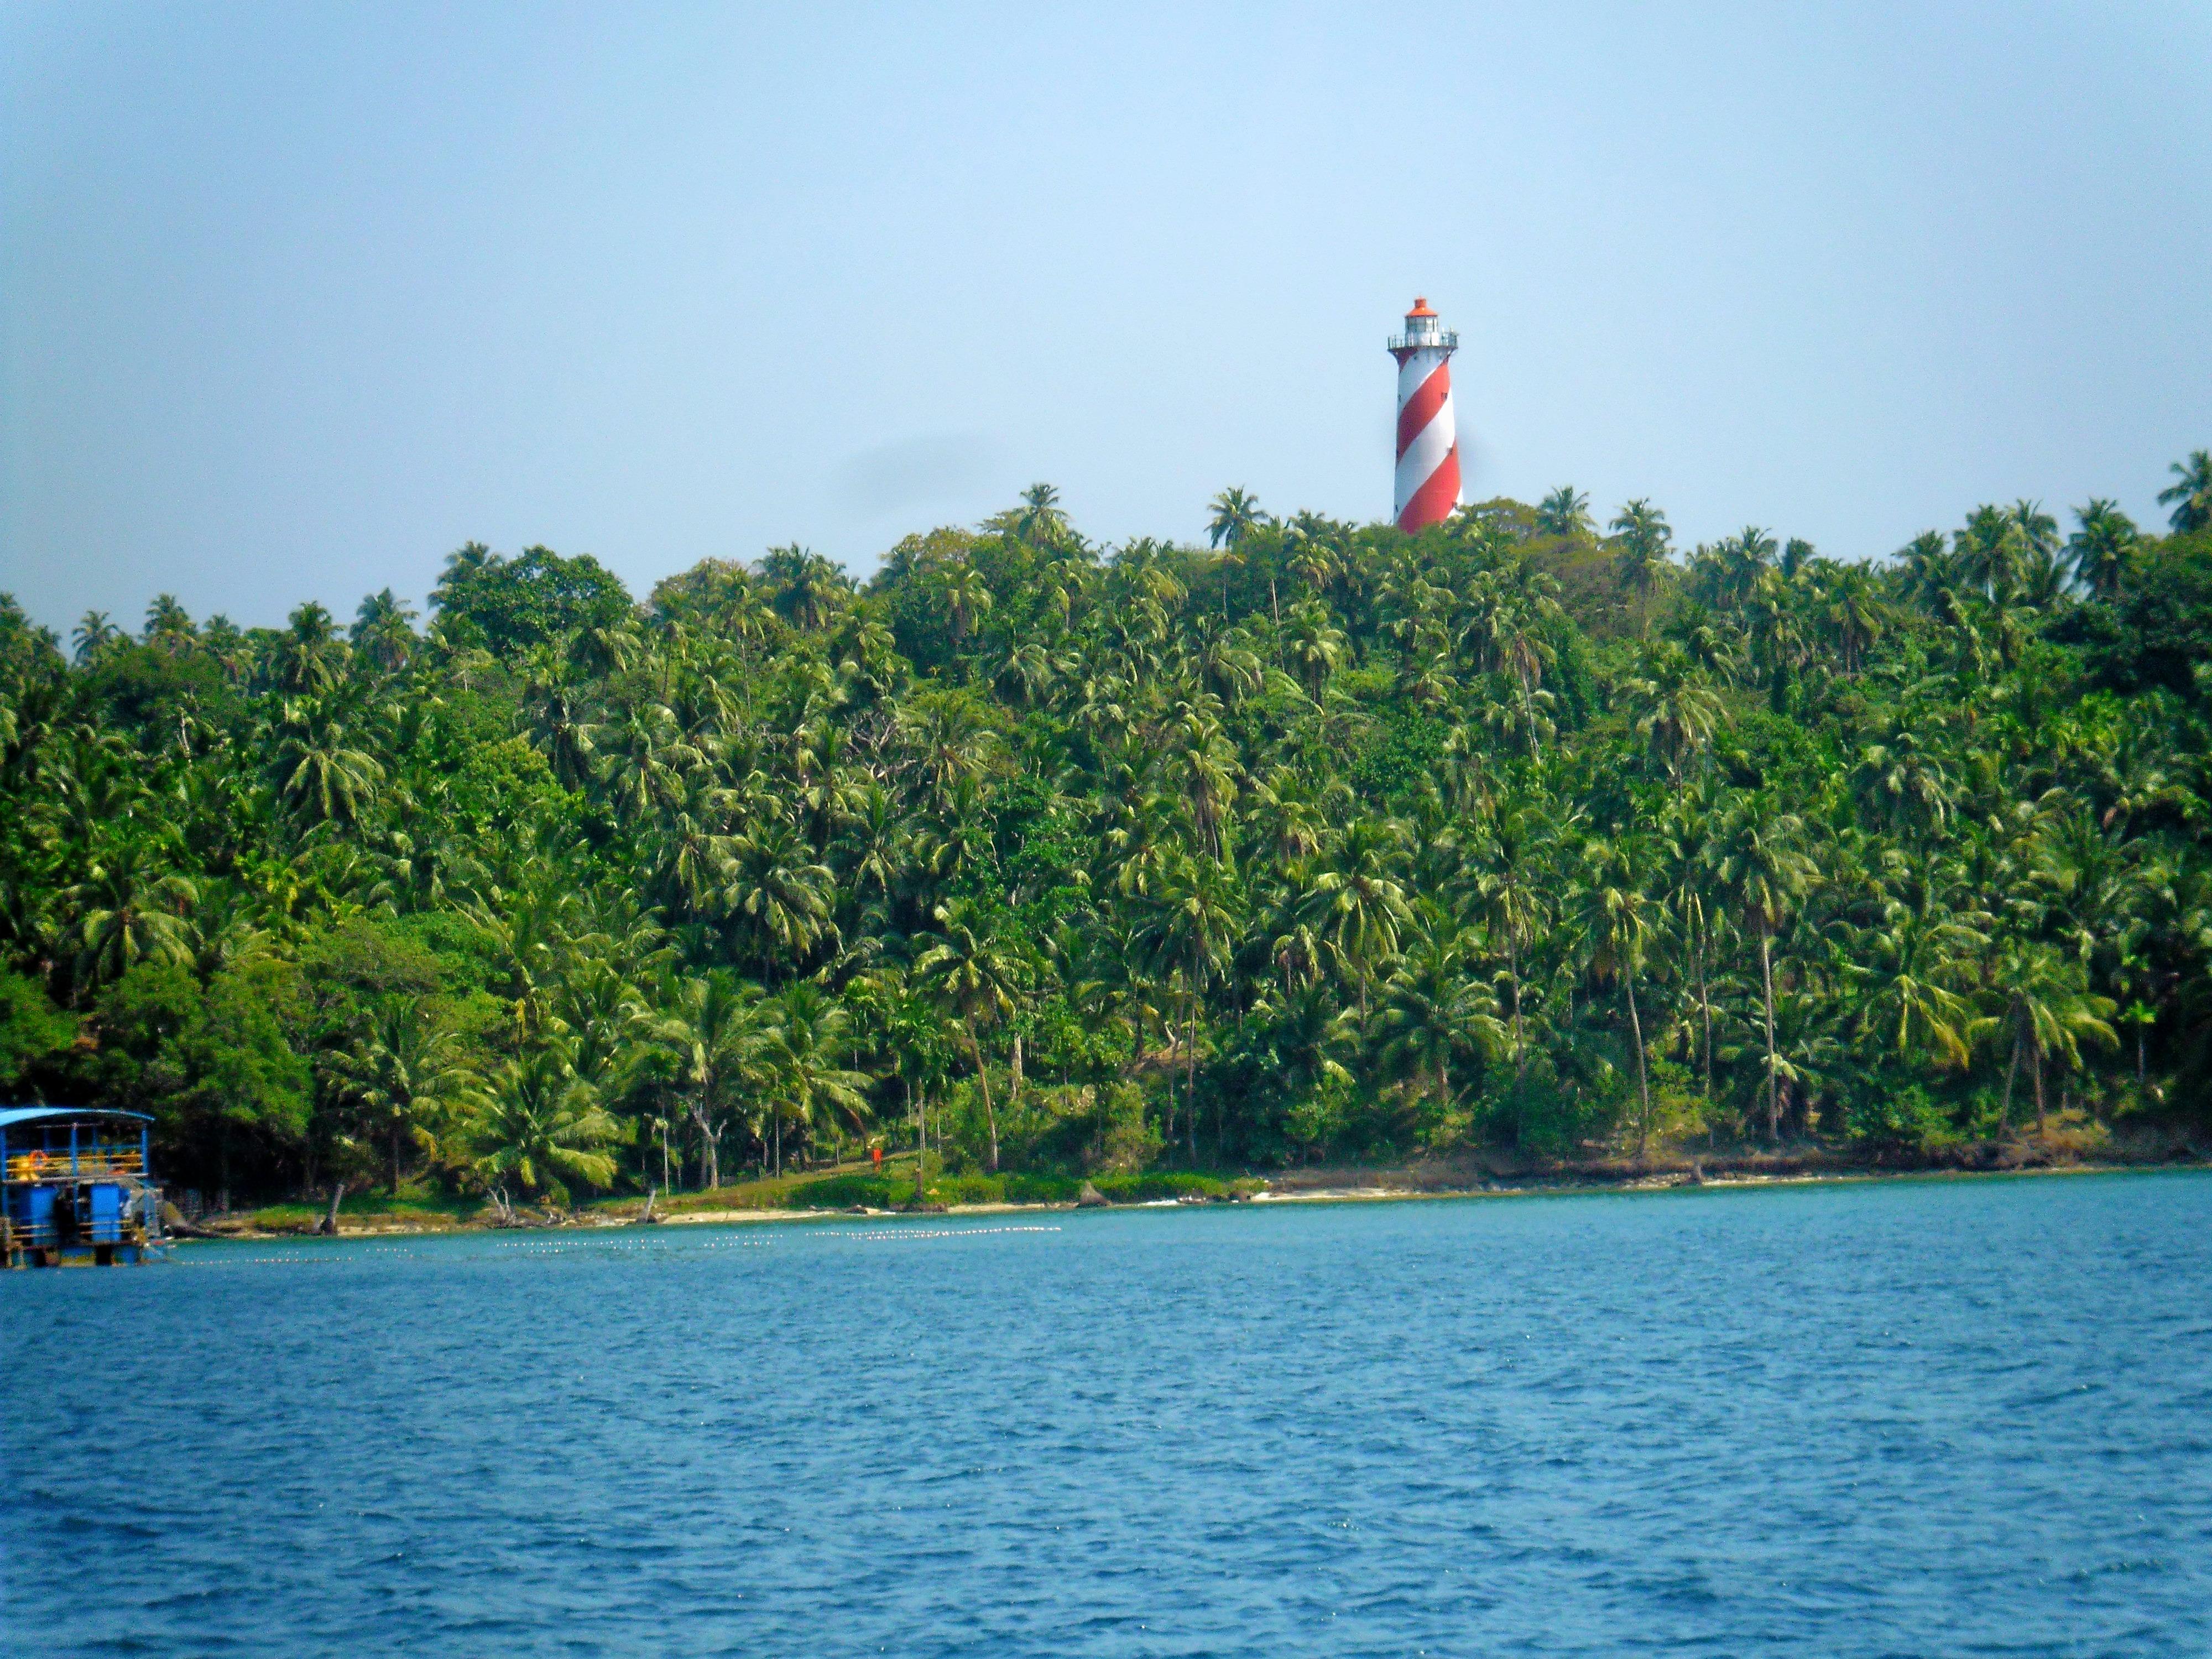 1502973759_andaman_honeymoon_north_island.jpg